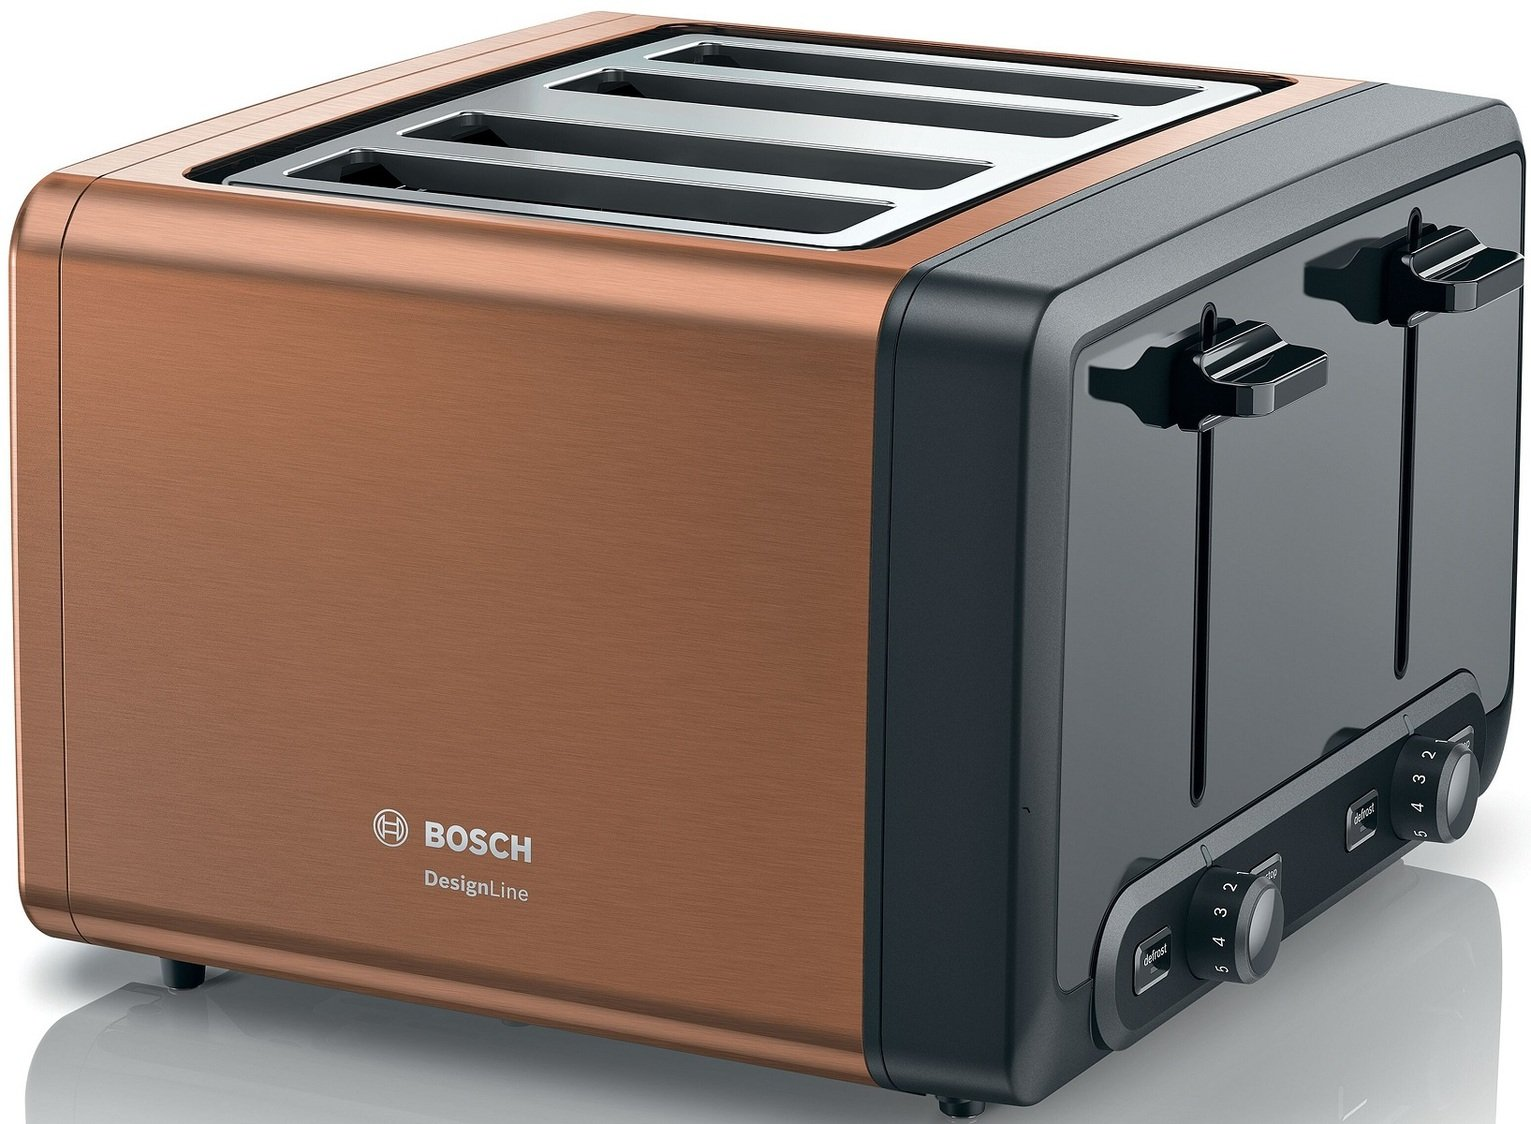 Bosch TAT4P449GB DesignLine 4 Slice Toaster - Copper